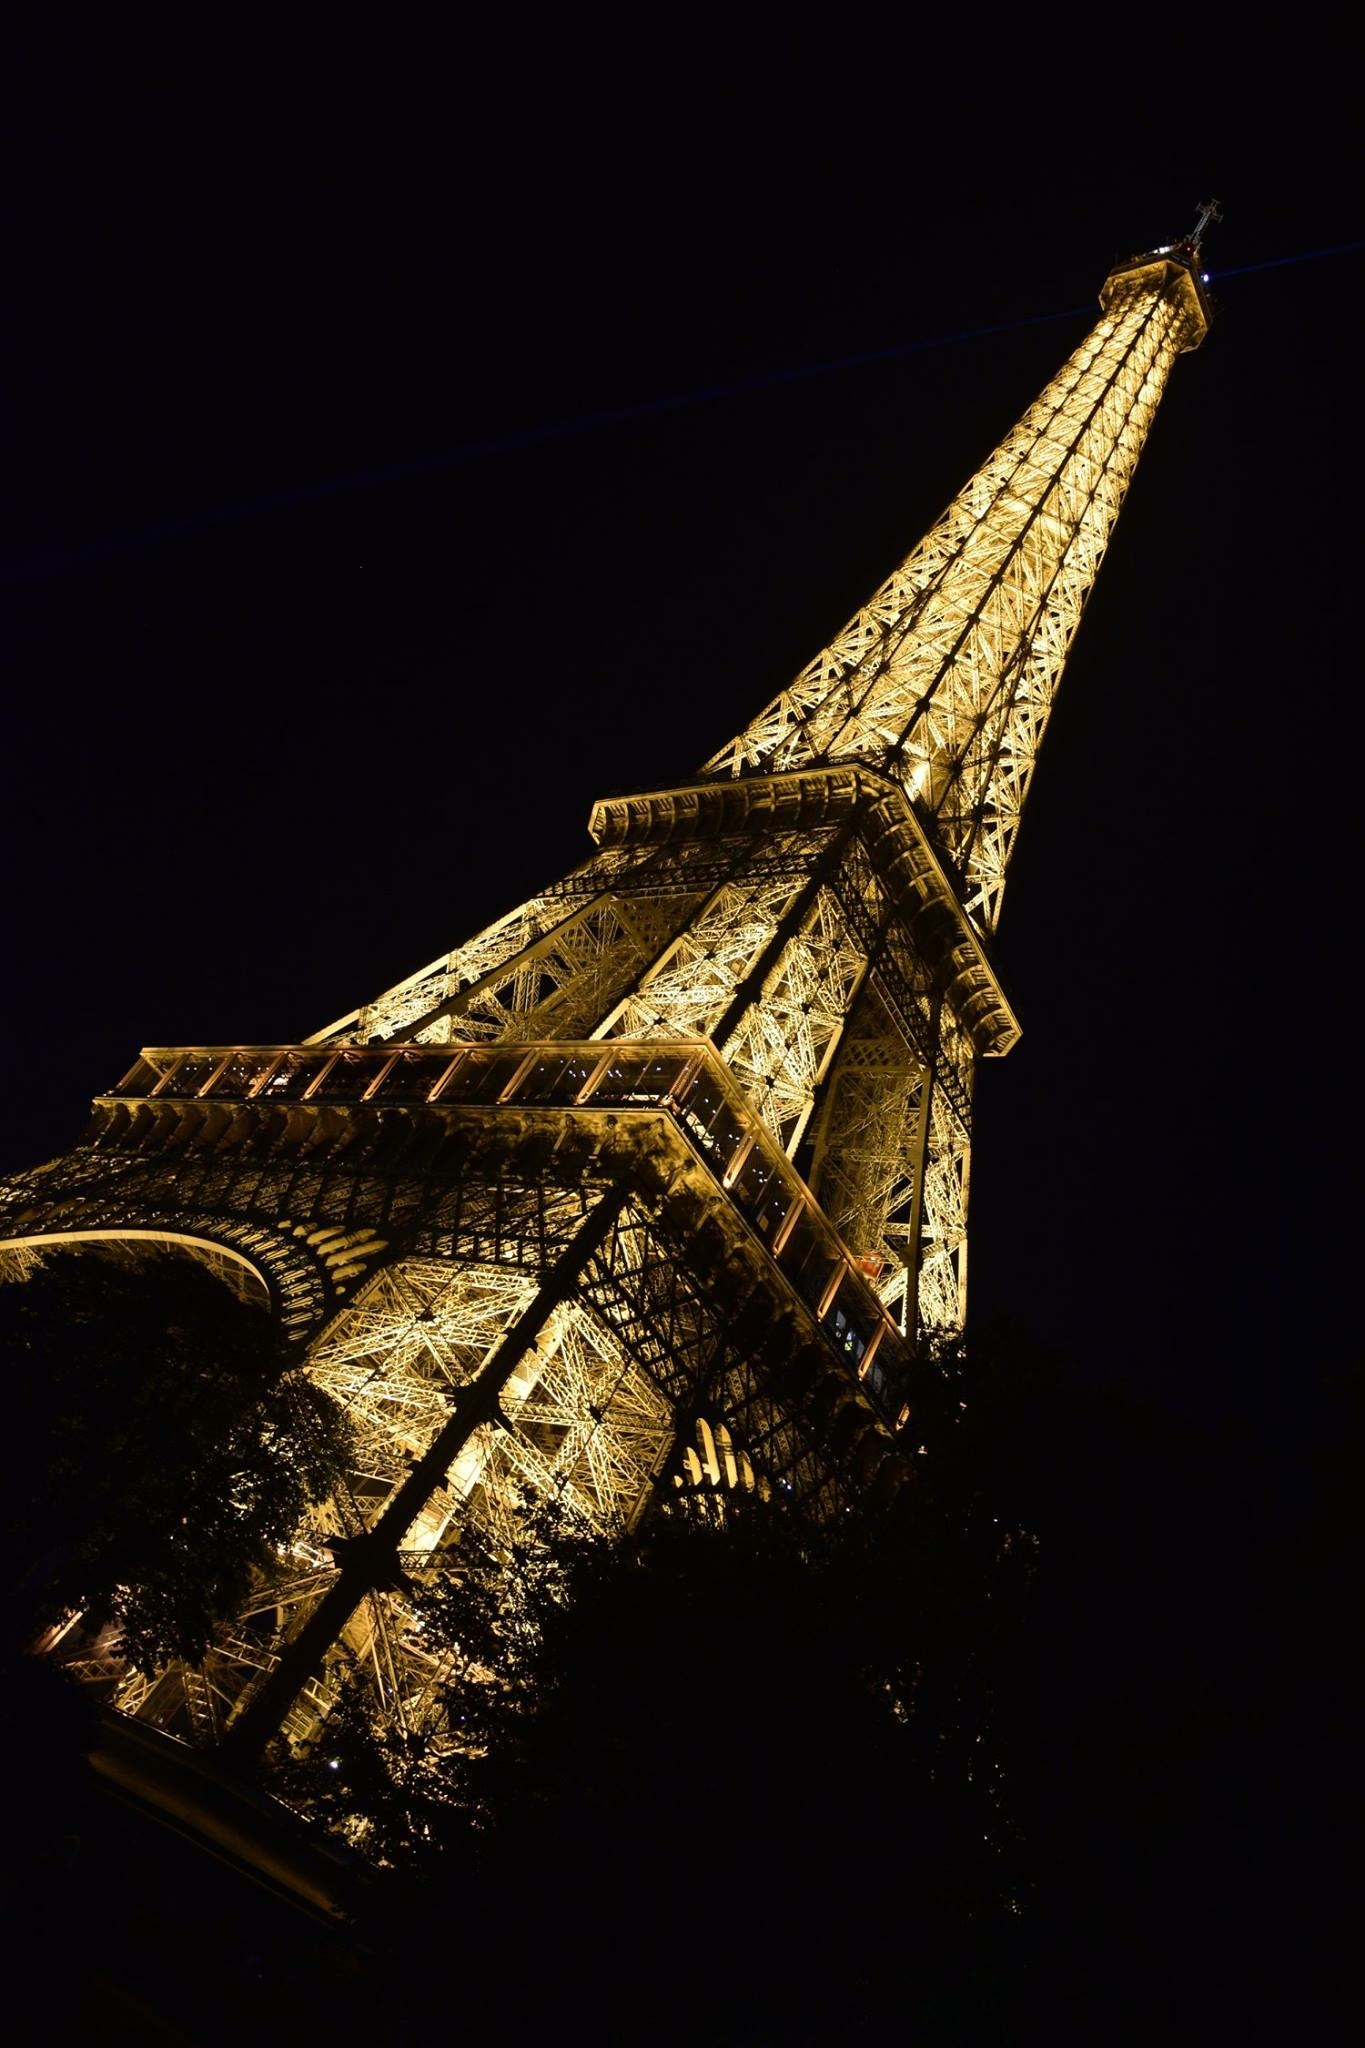 Eiffel Tower by Ivana Castelo-Branco